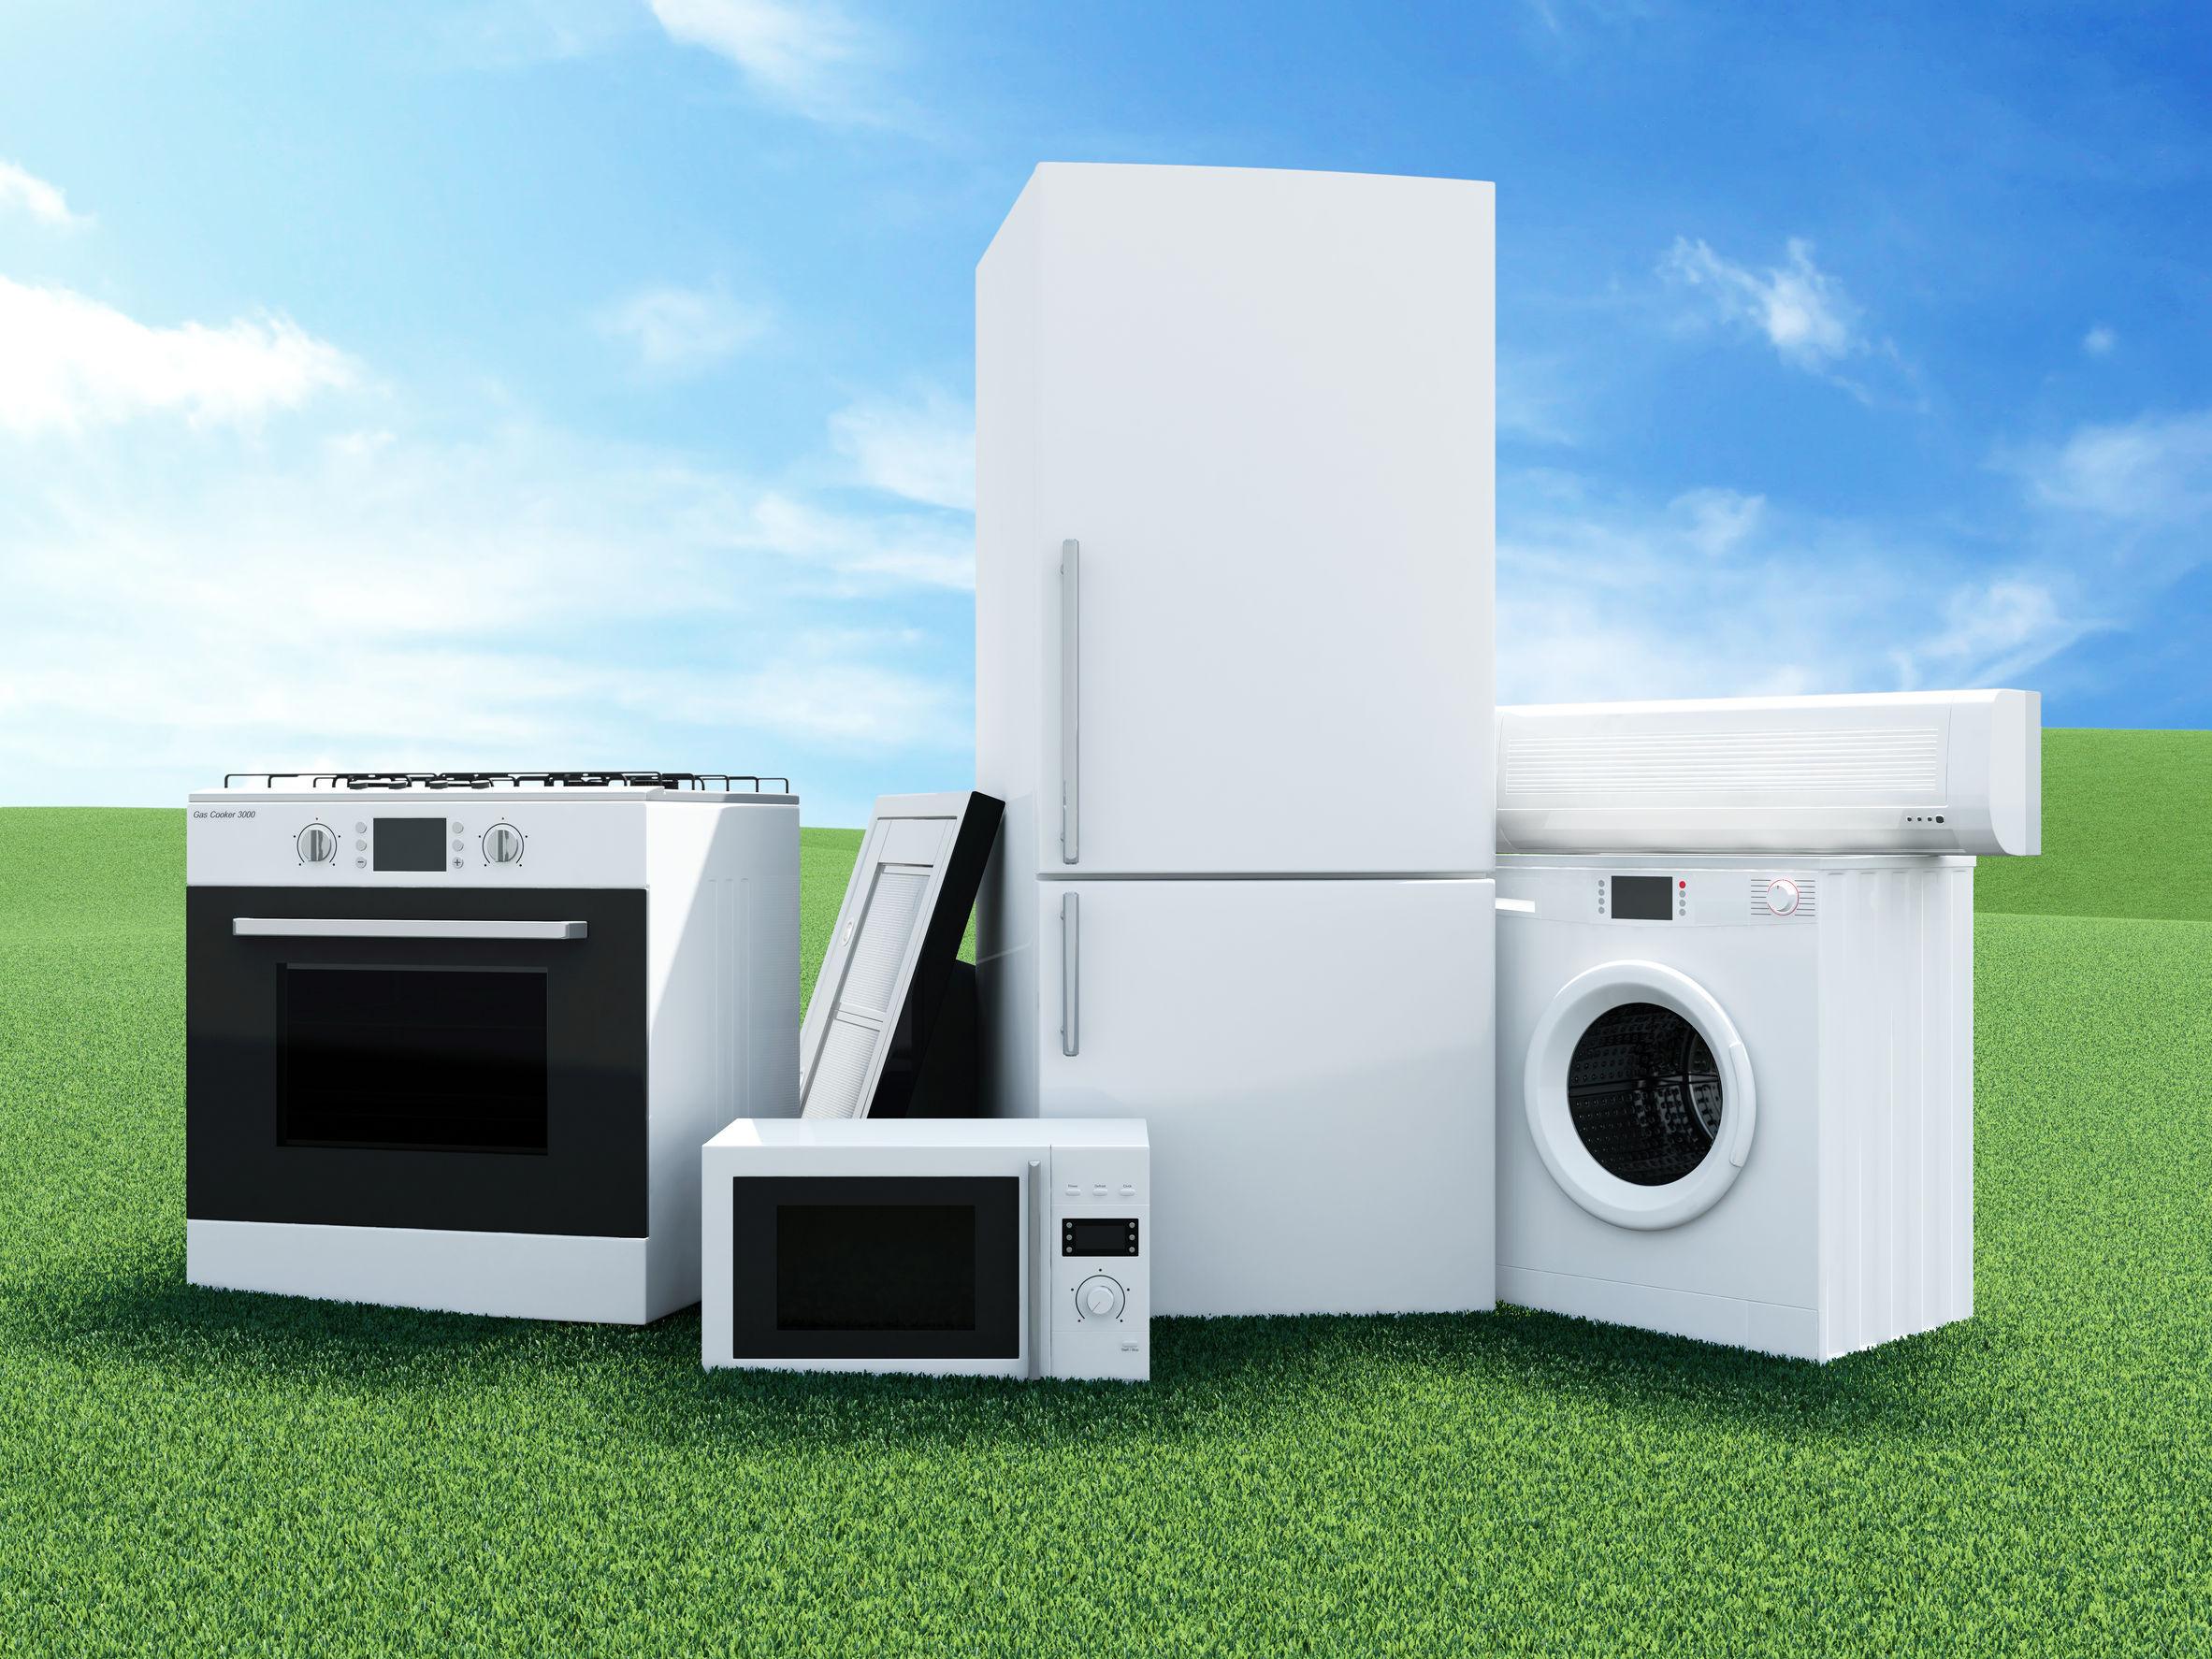 OnSite Appliance Repair